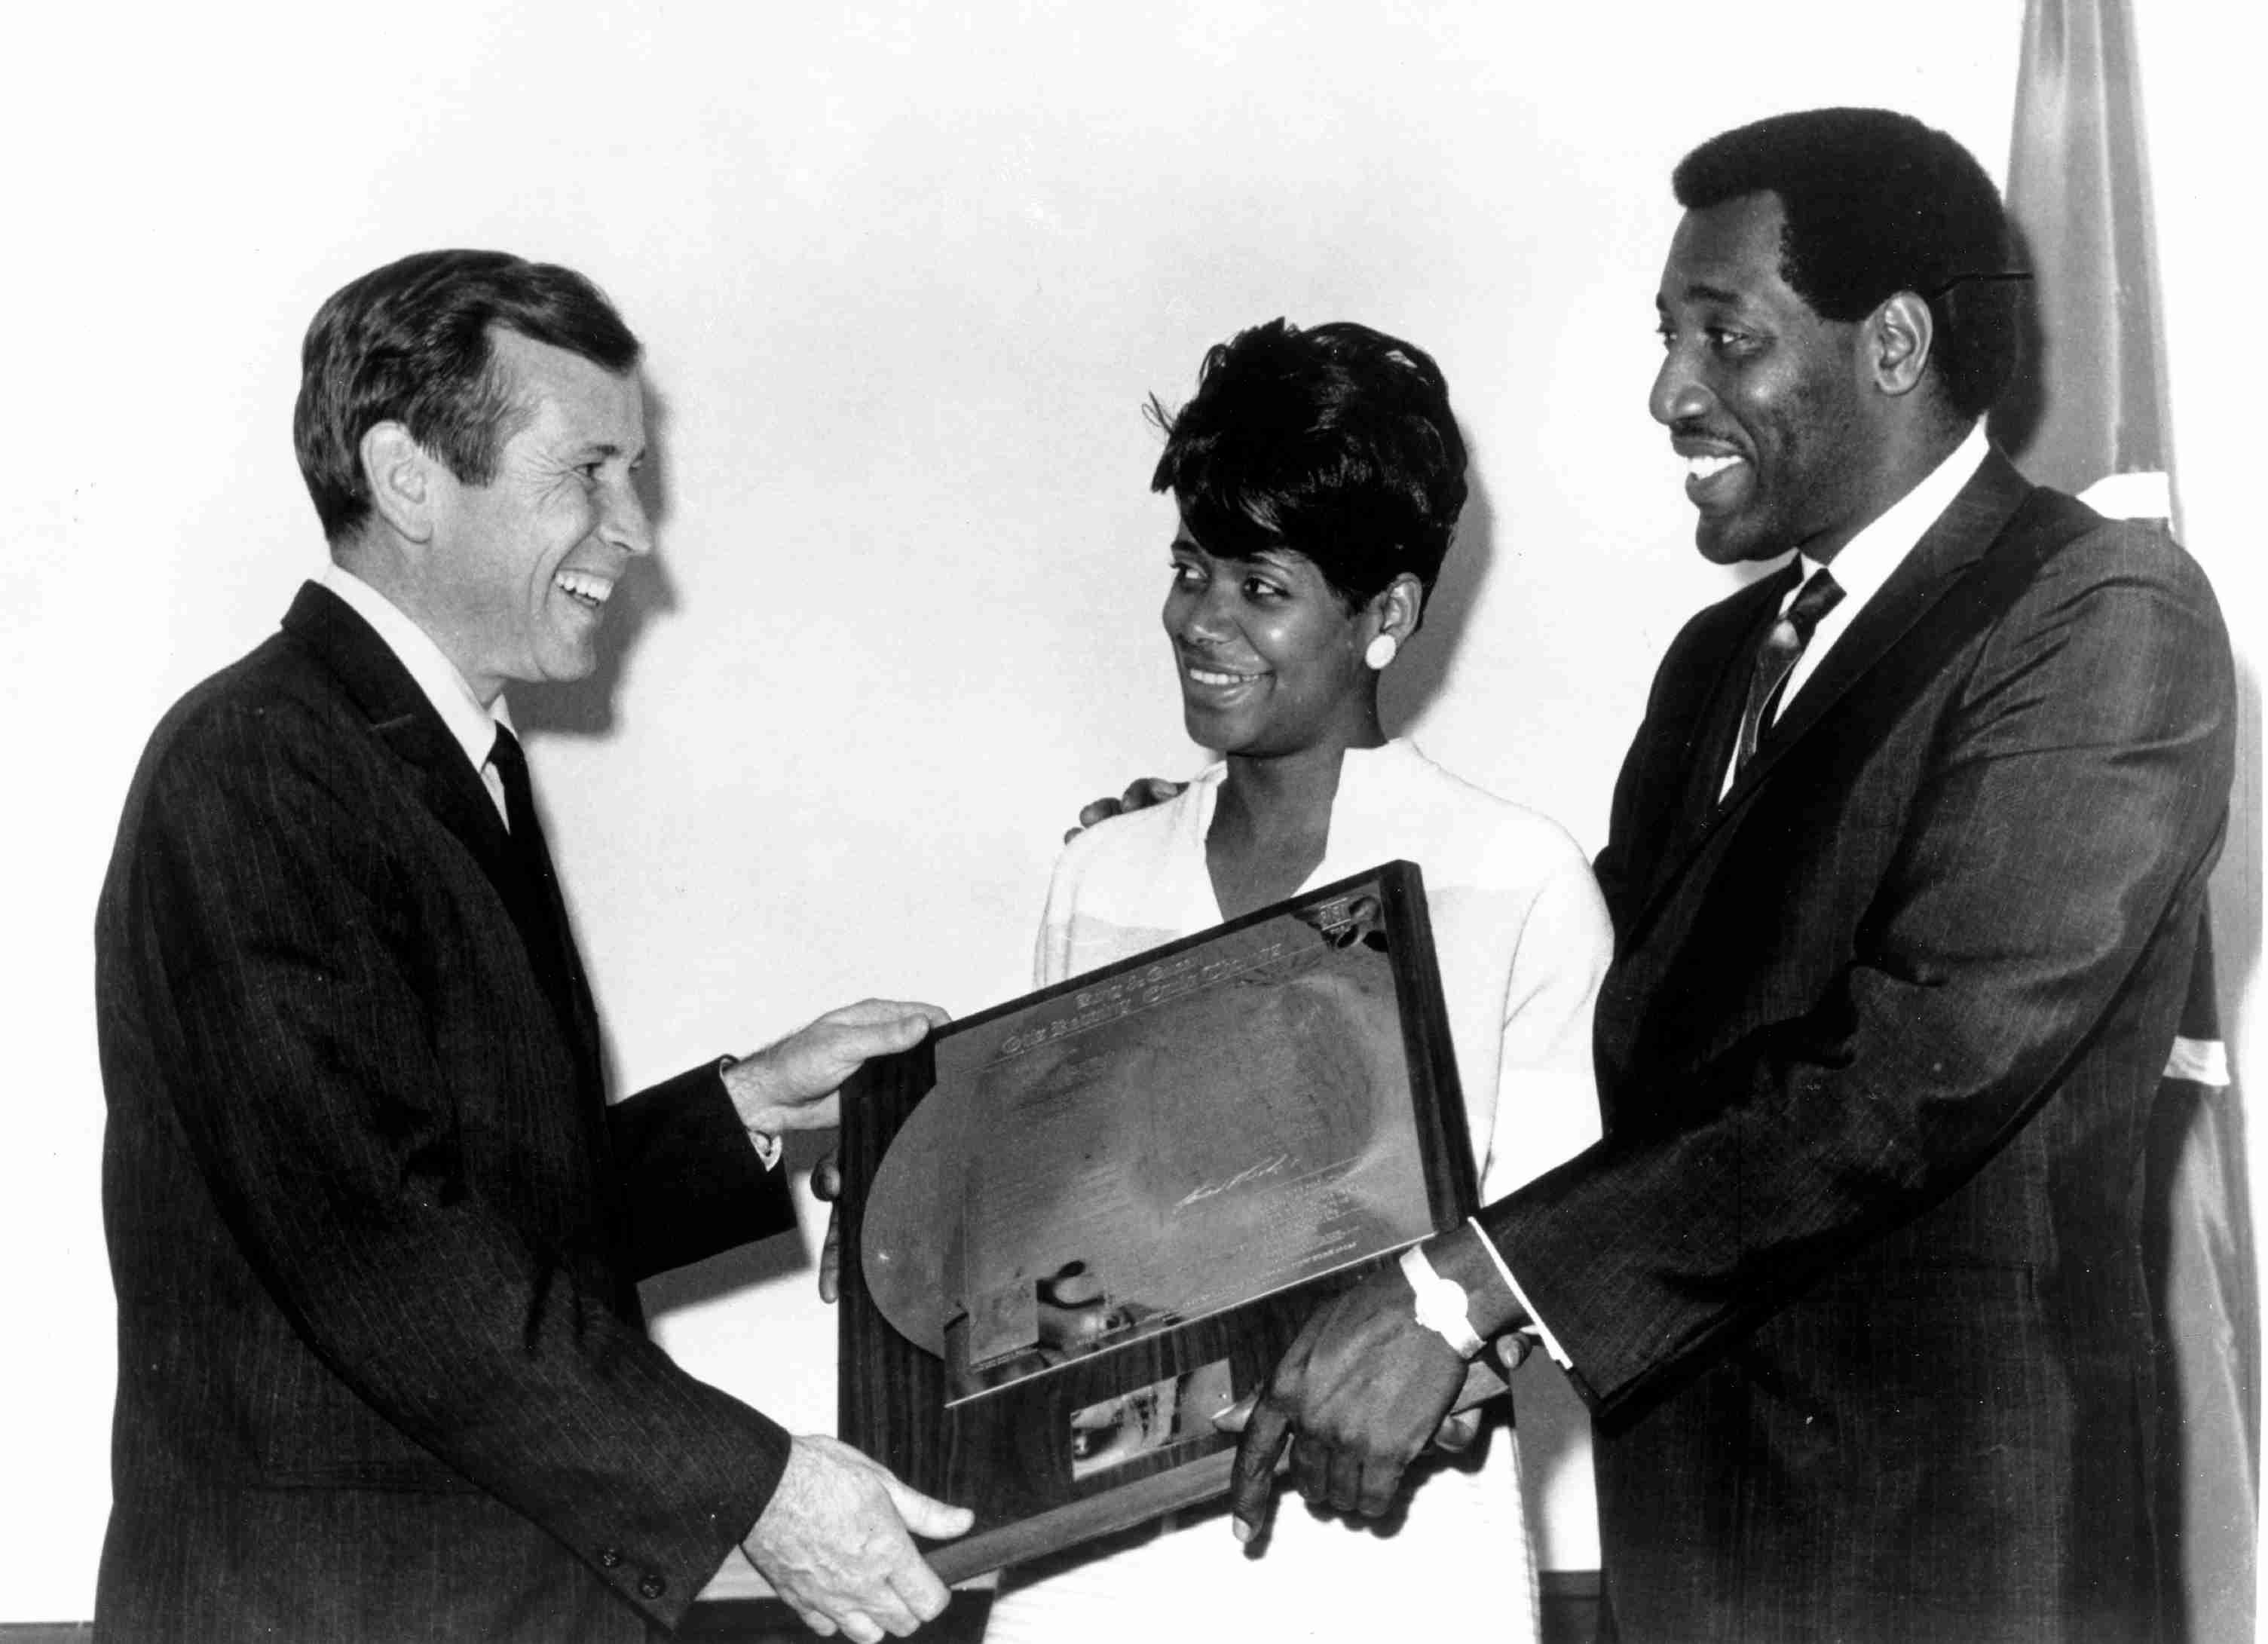 Senator Howard Baker with Carla Thomas & Otis Redding